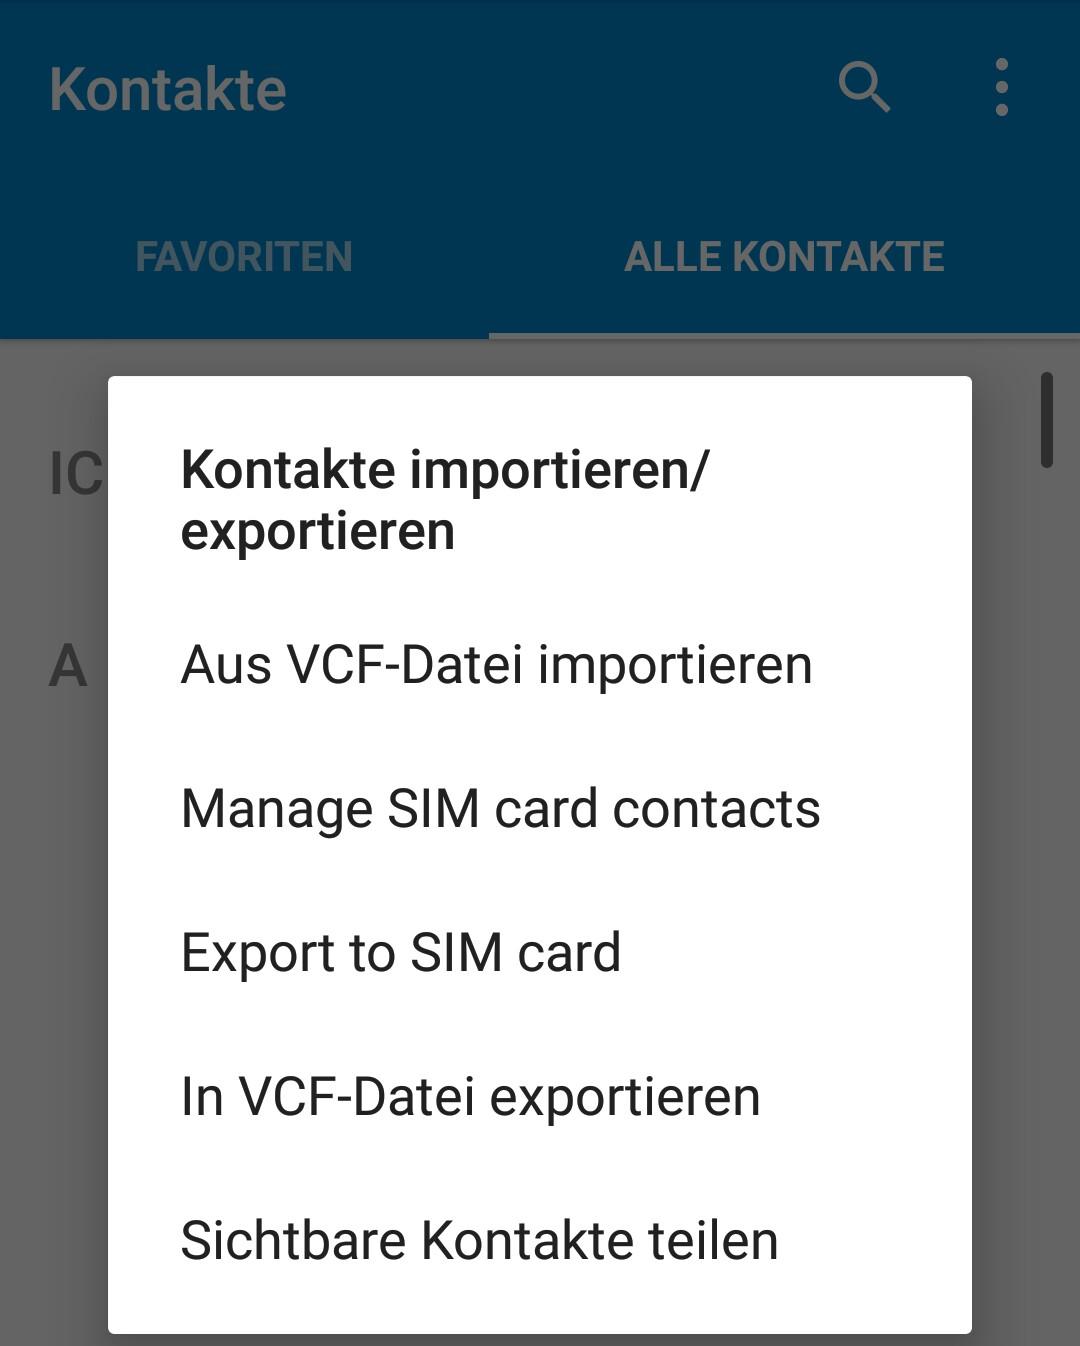 Beginner: Get my google backup on Fairphone open - FP2